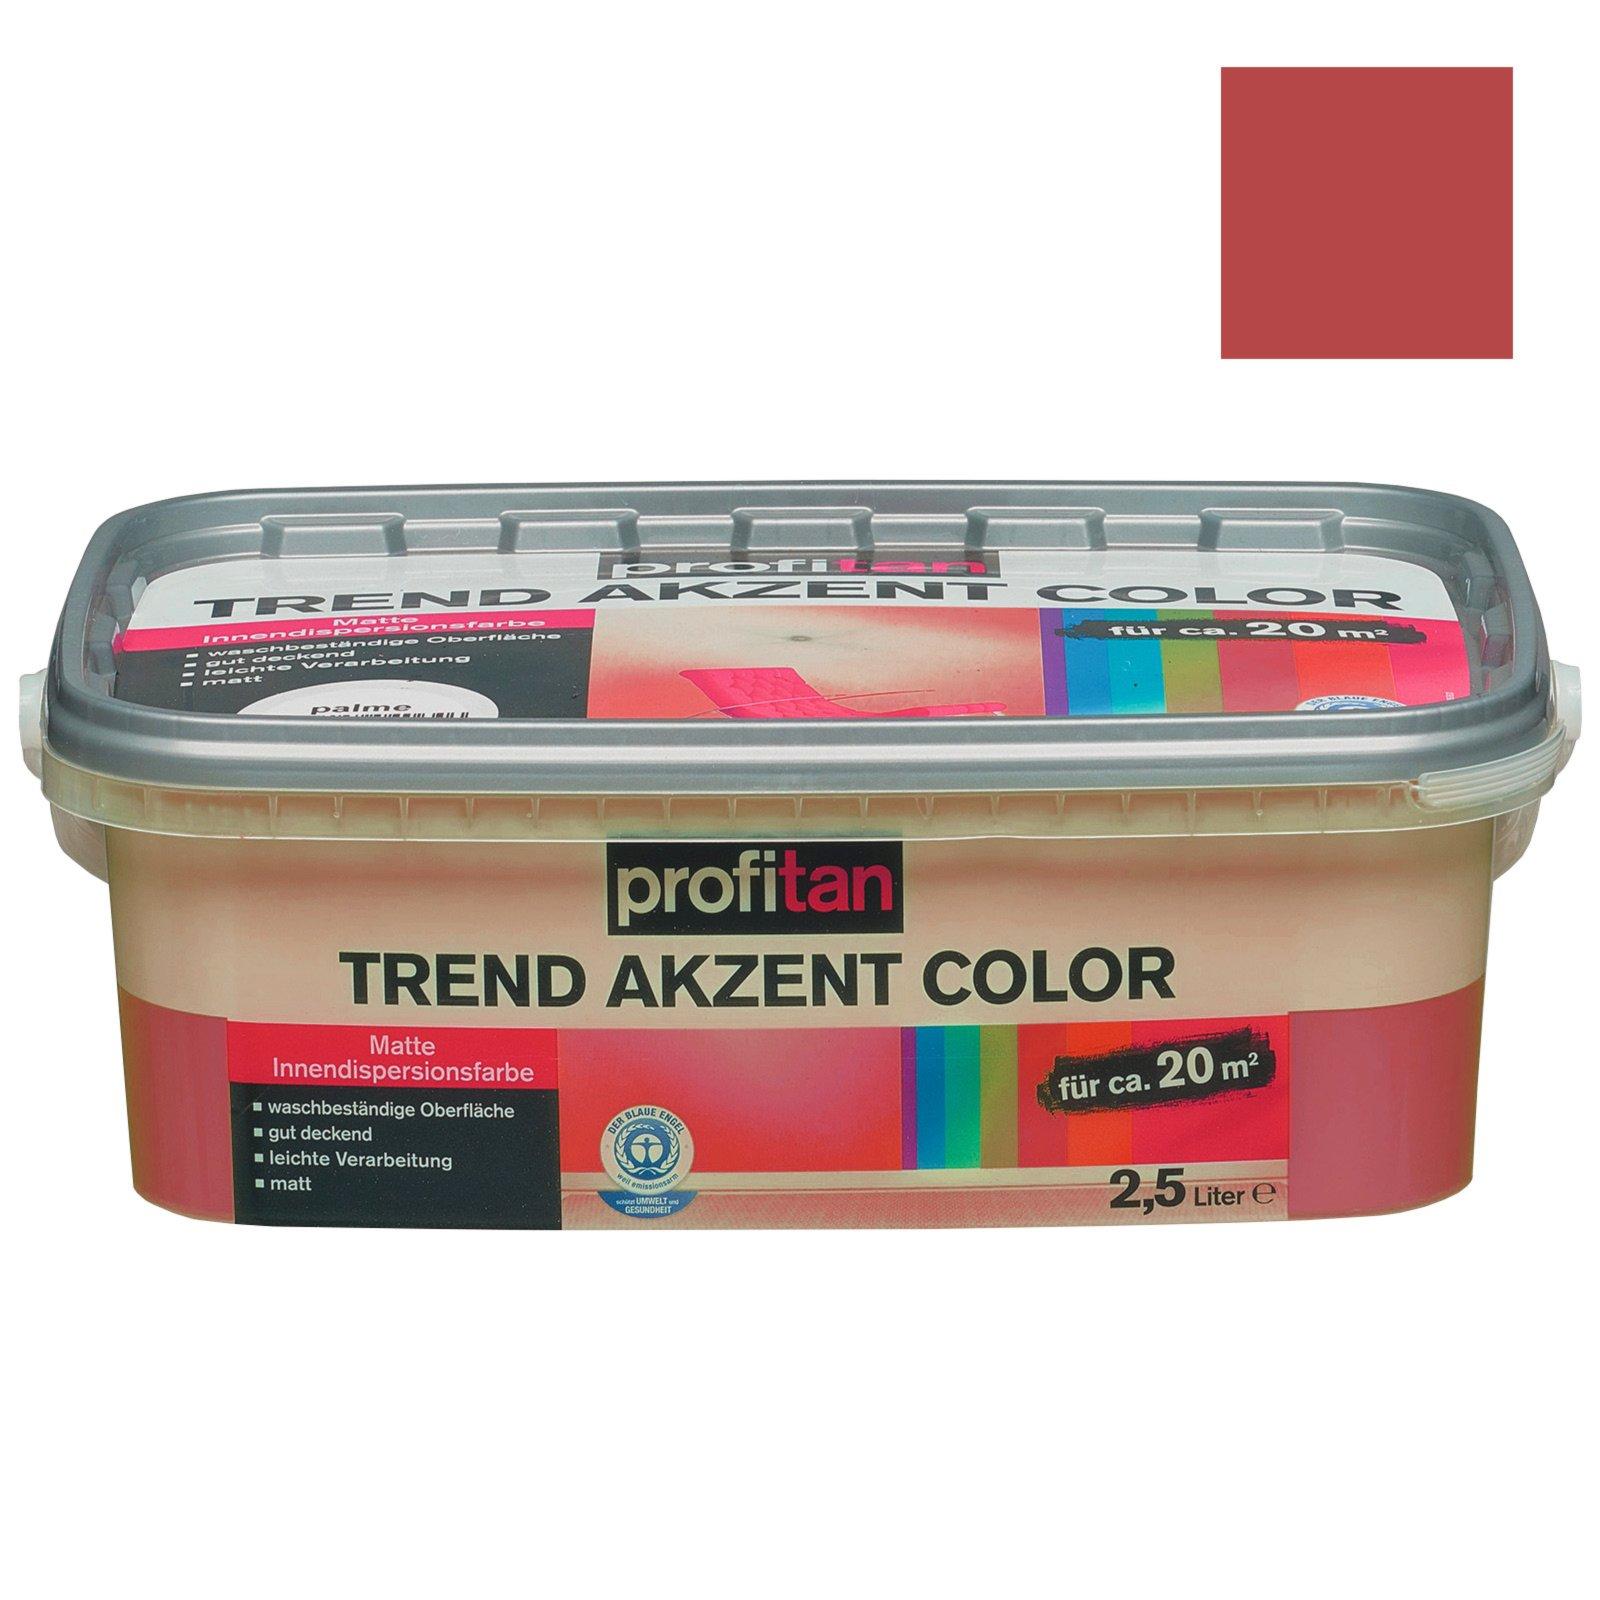 profitan wandfarbe trend akzent color vulkan matt 2 5 liter wandfarben deckenfarben. Black Bedroom Furniture Sets. Home Design Ideas